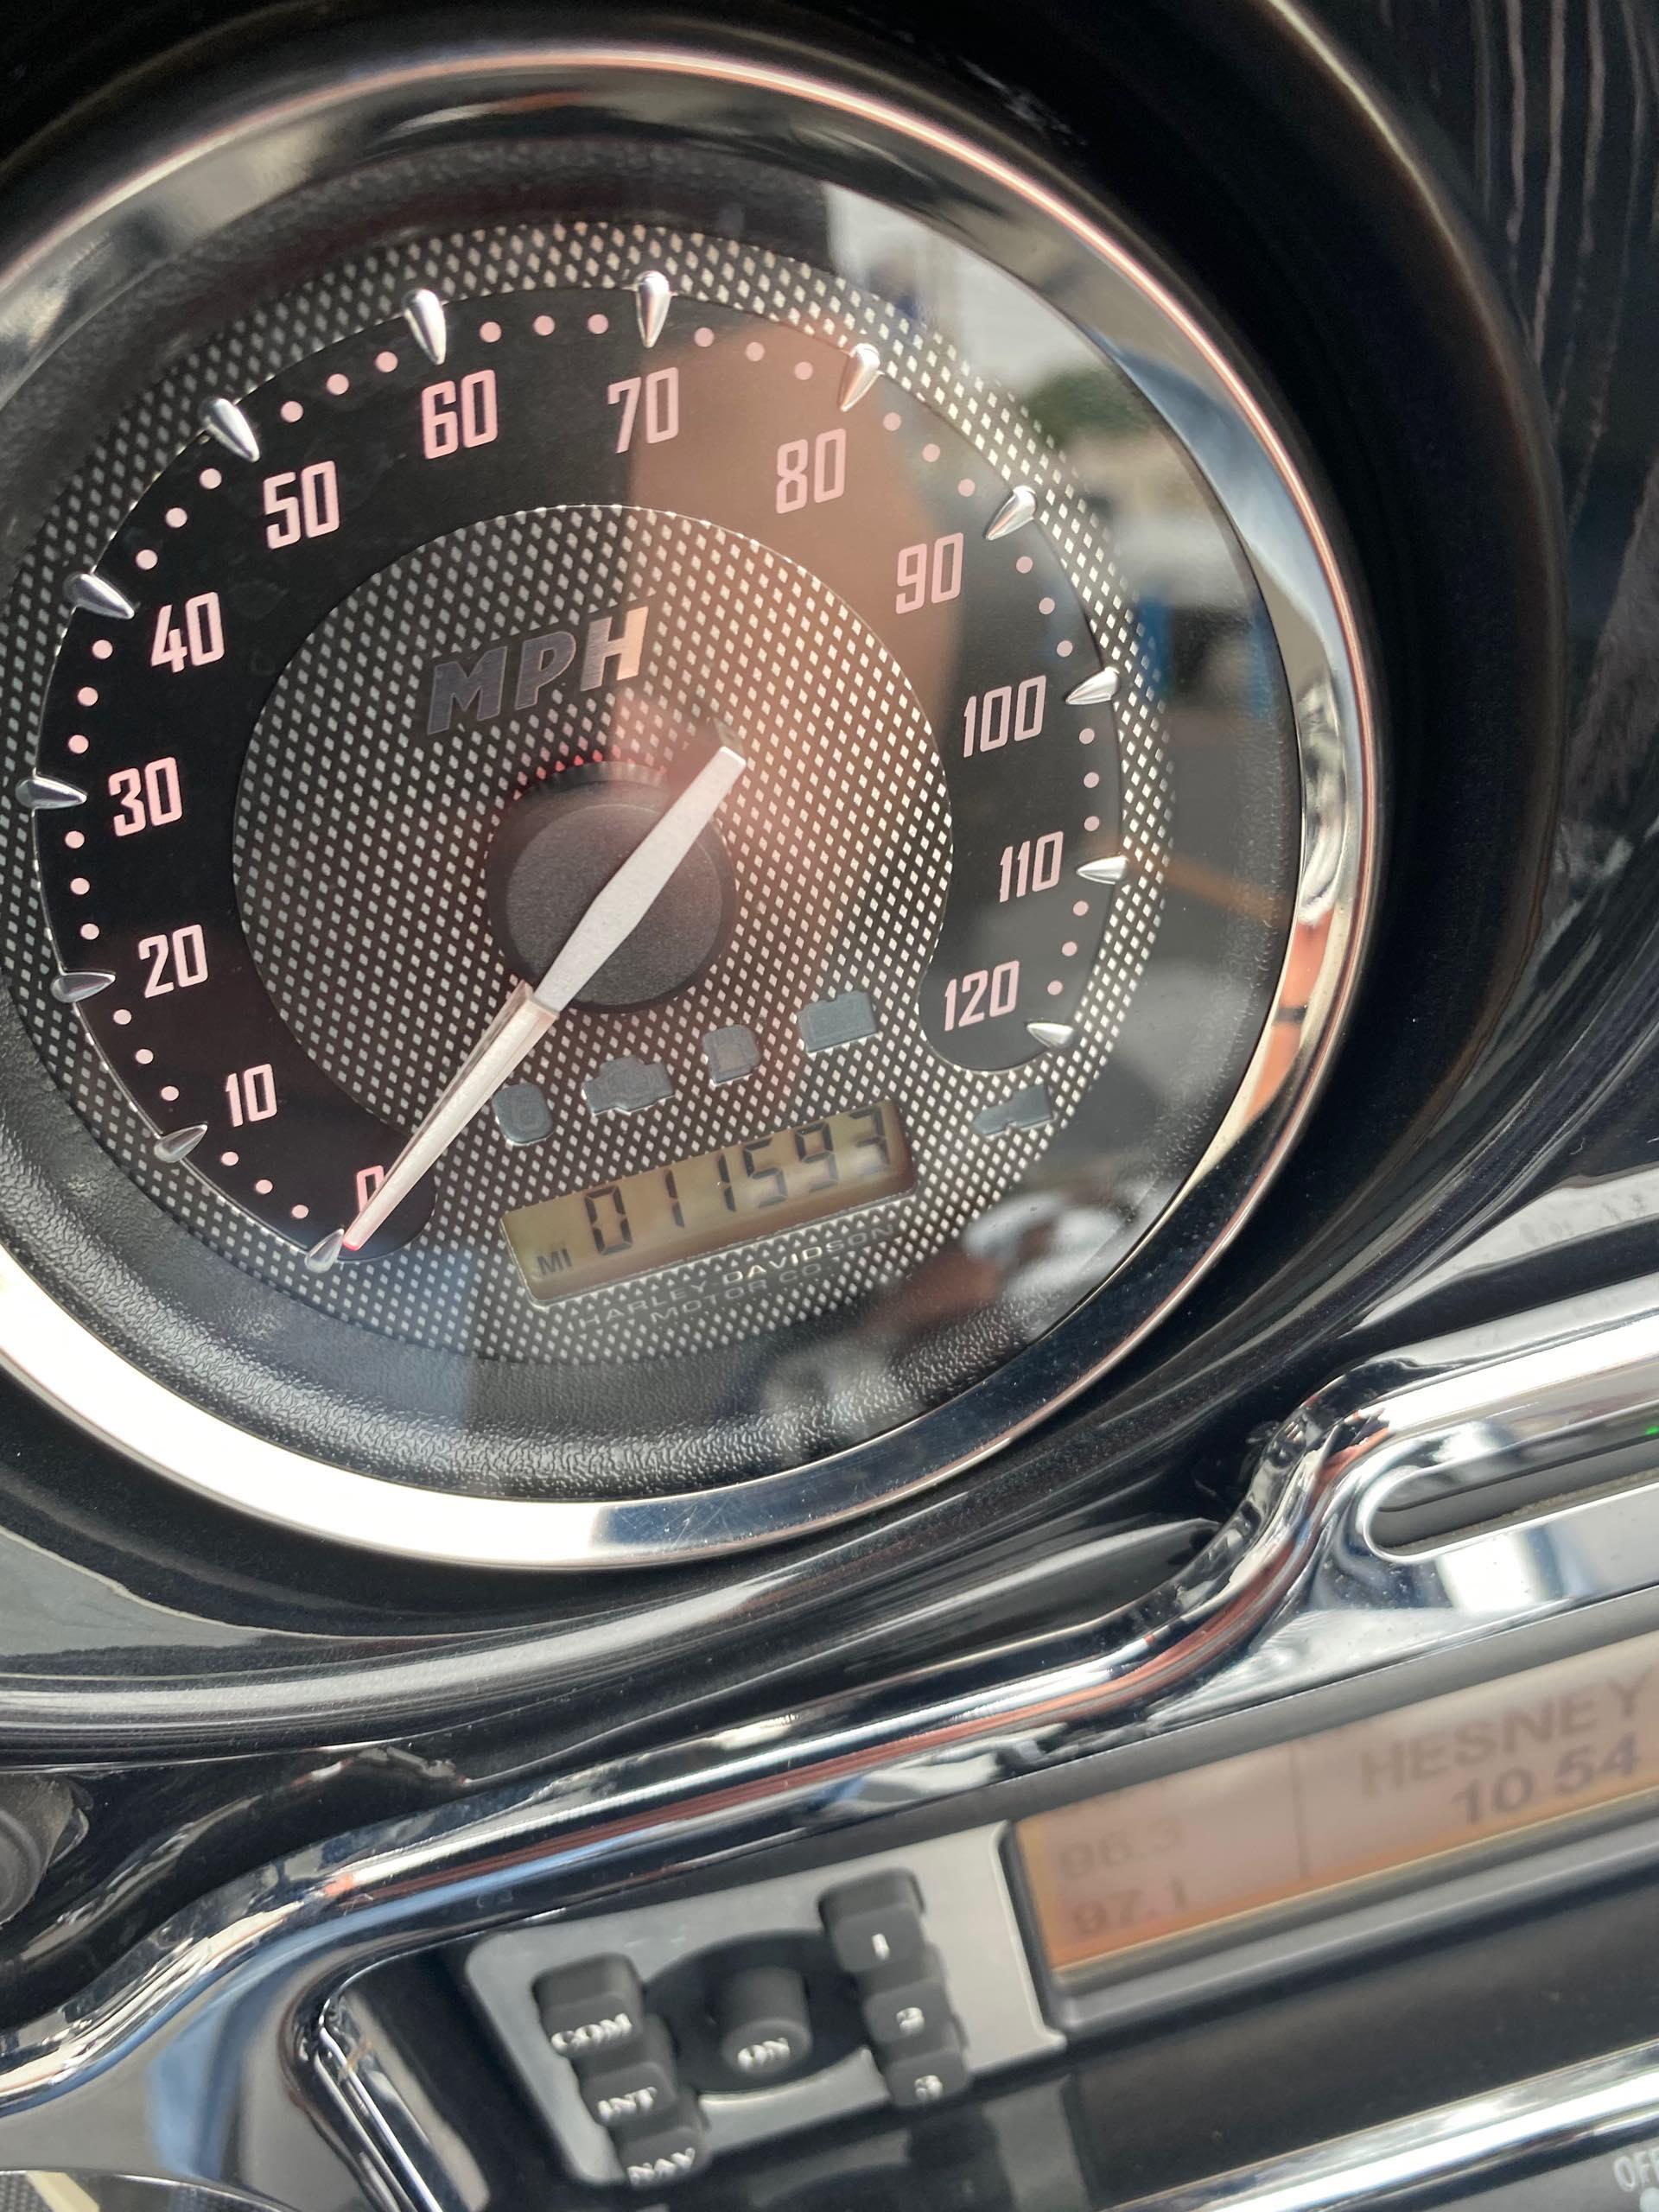 2013 Harley-Davidson Electra Glide CVO Ultra Classic 110th Anniversary Edition at Thunder Harley-Davidson